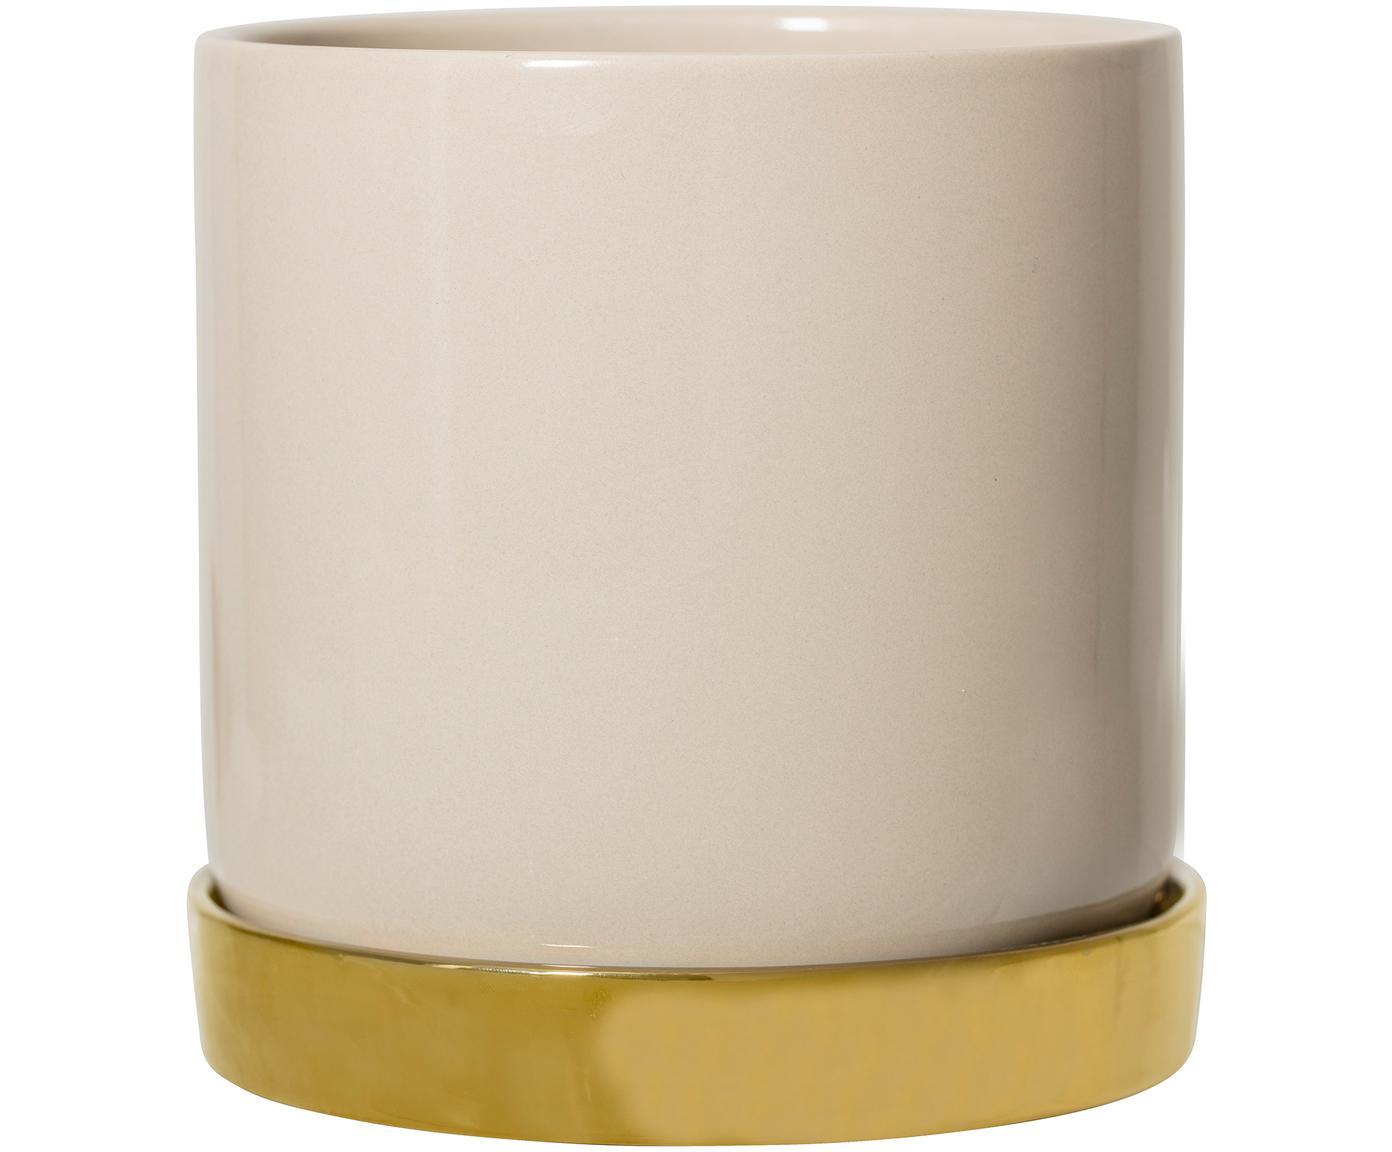 Pflanztopf Elin, Steingut, Topf: BeigeUntersetzer: Gold, Ø 14 x H 14 cm